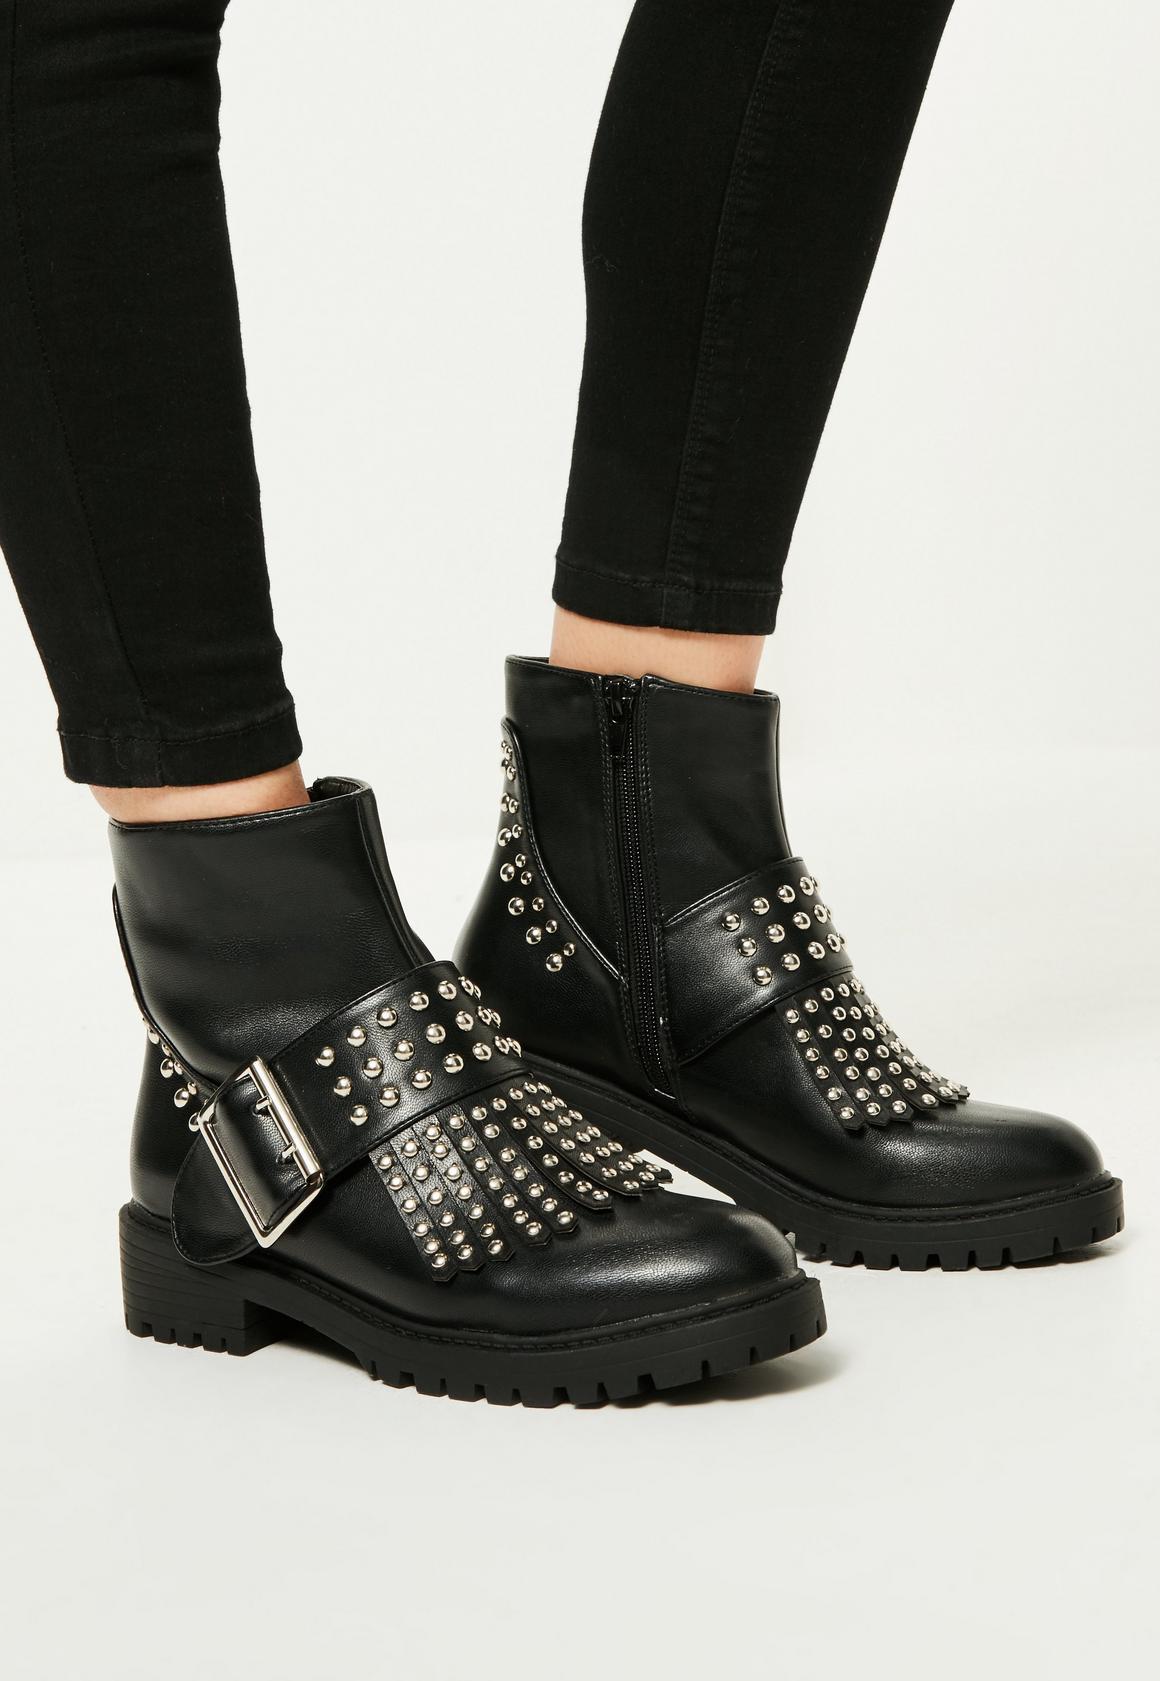 Boots - Previous Next